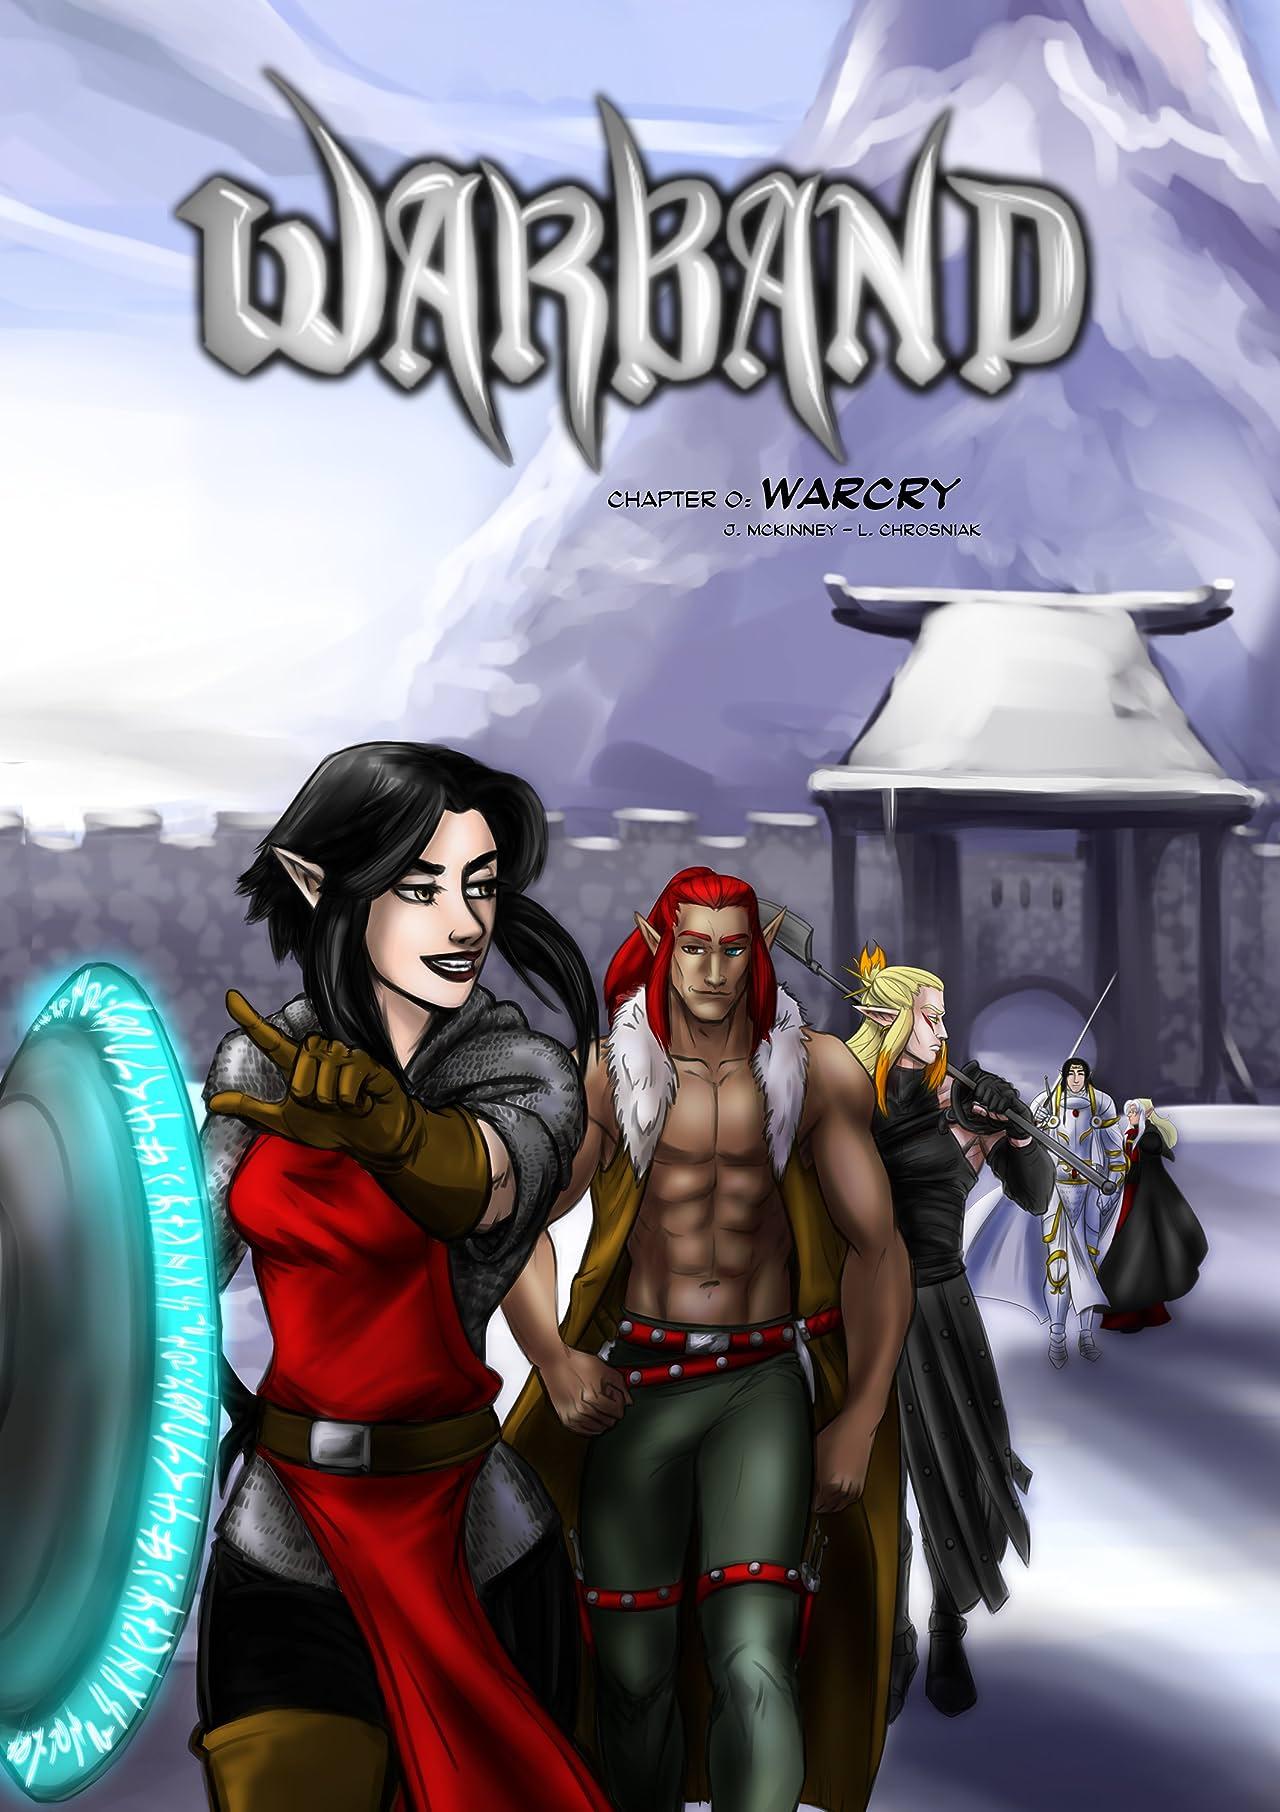 WARBAND #0